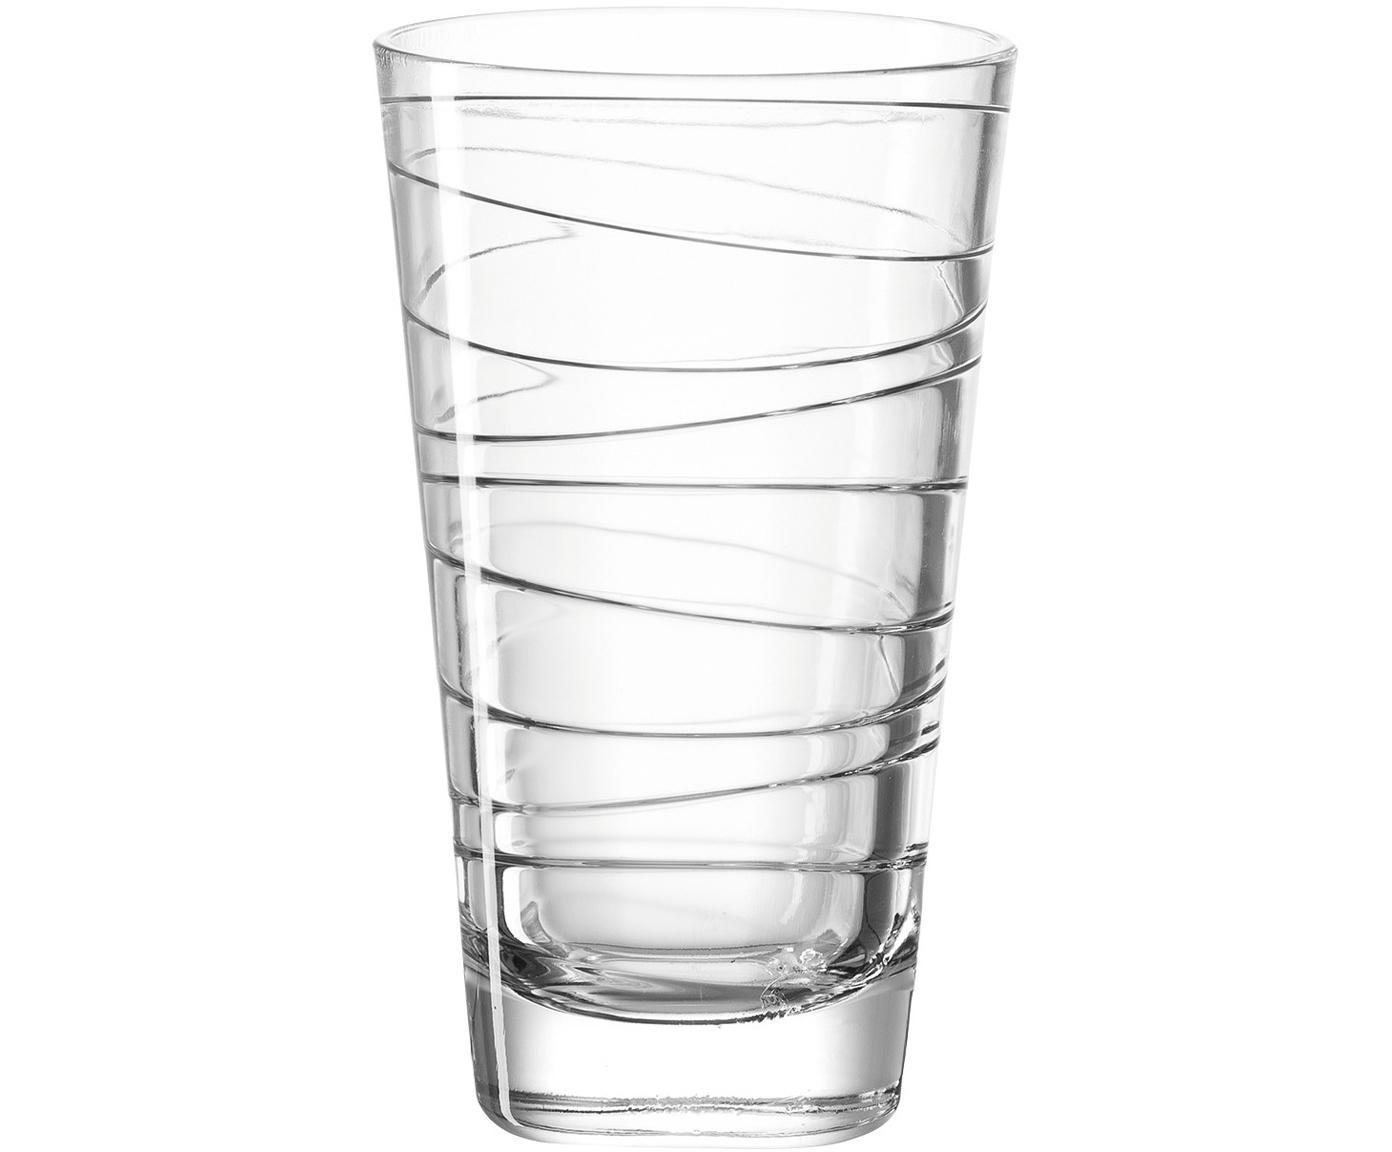 Bicchiere acqua Vario 6 pz, Vetro di soda-calce, Trasparente, Ø 8 x Alt. 13 cm